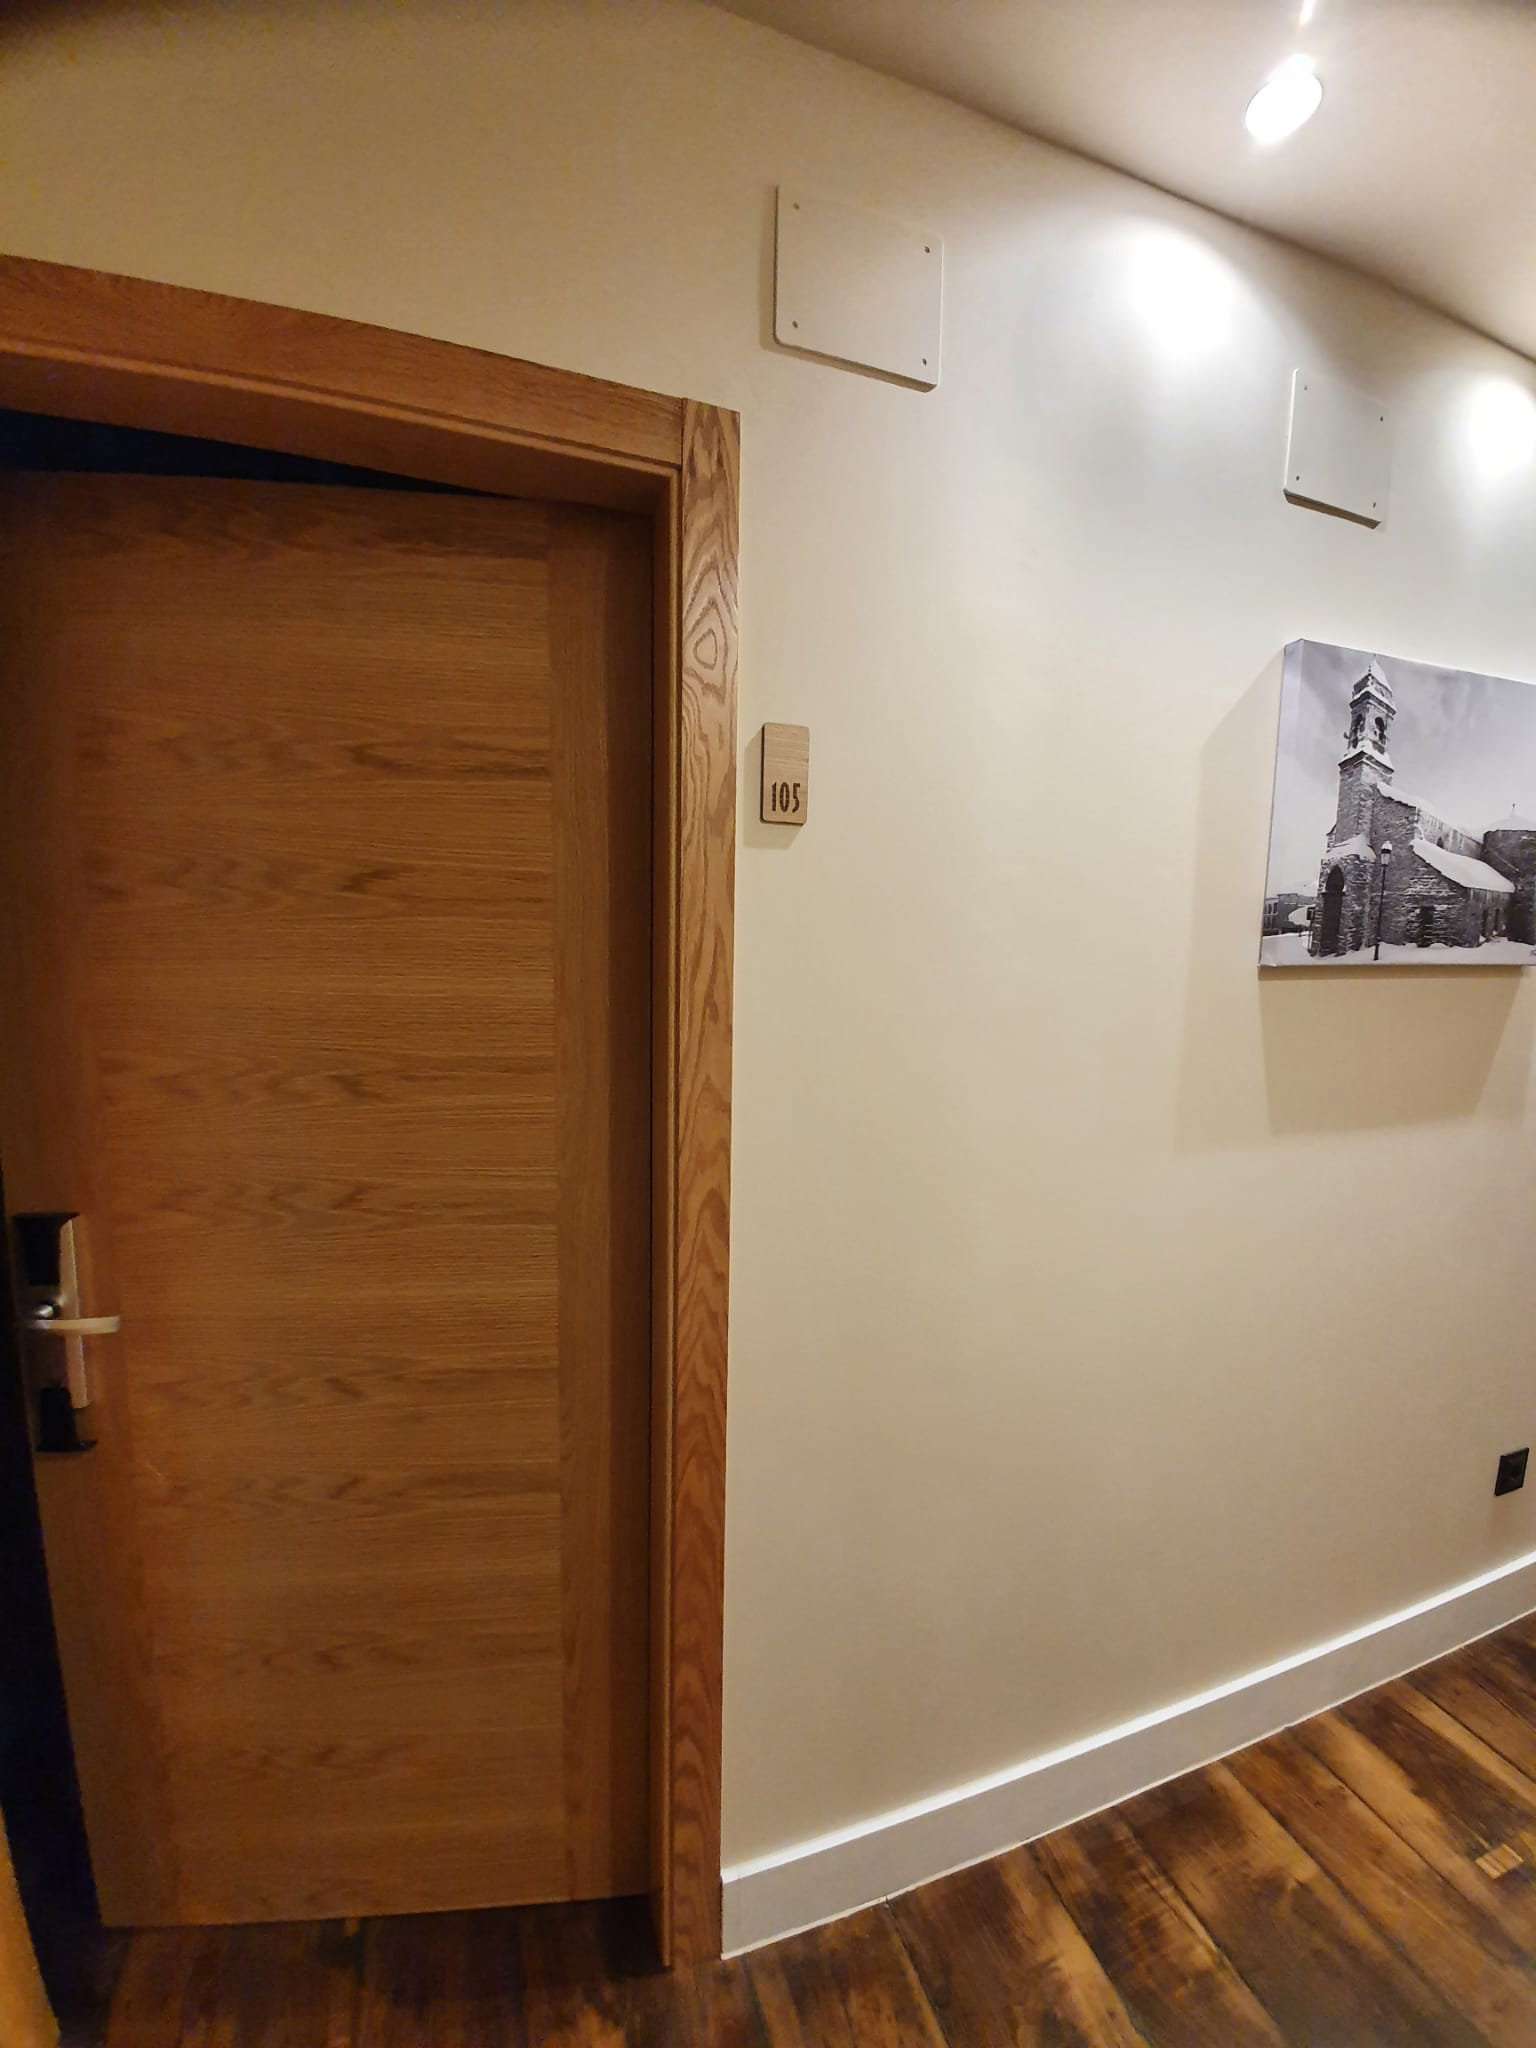 habitacion 105 casa cuartel Fonsagrada (7)